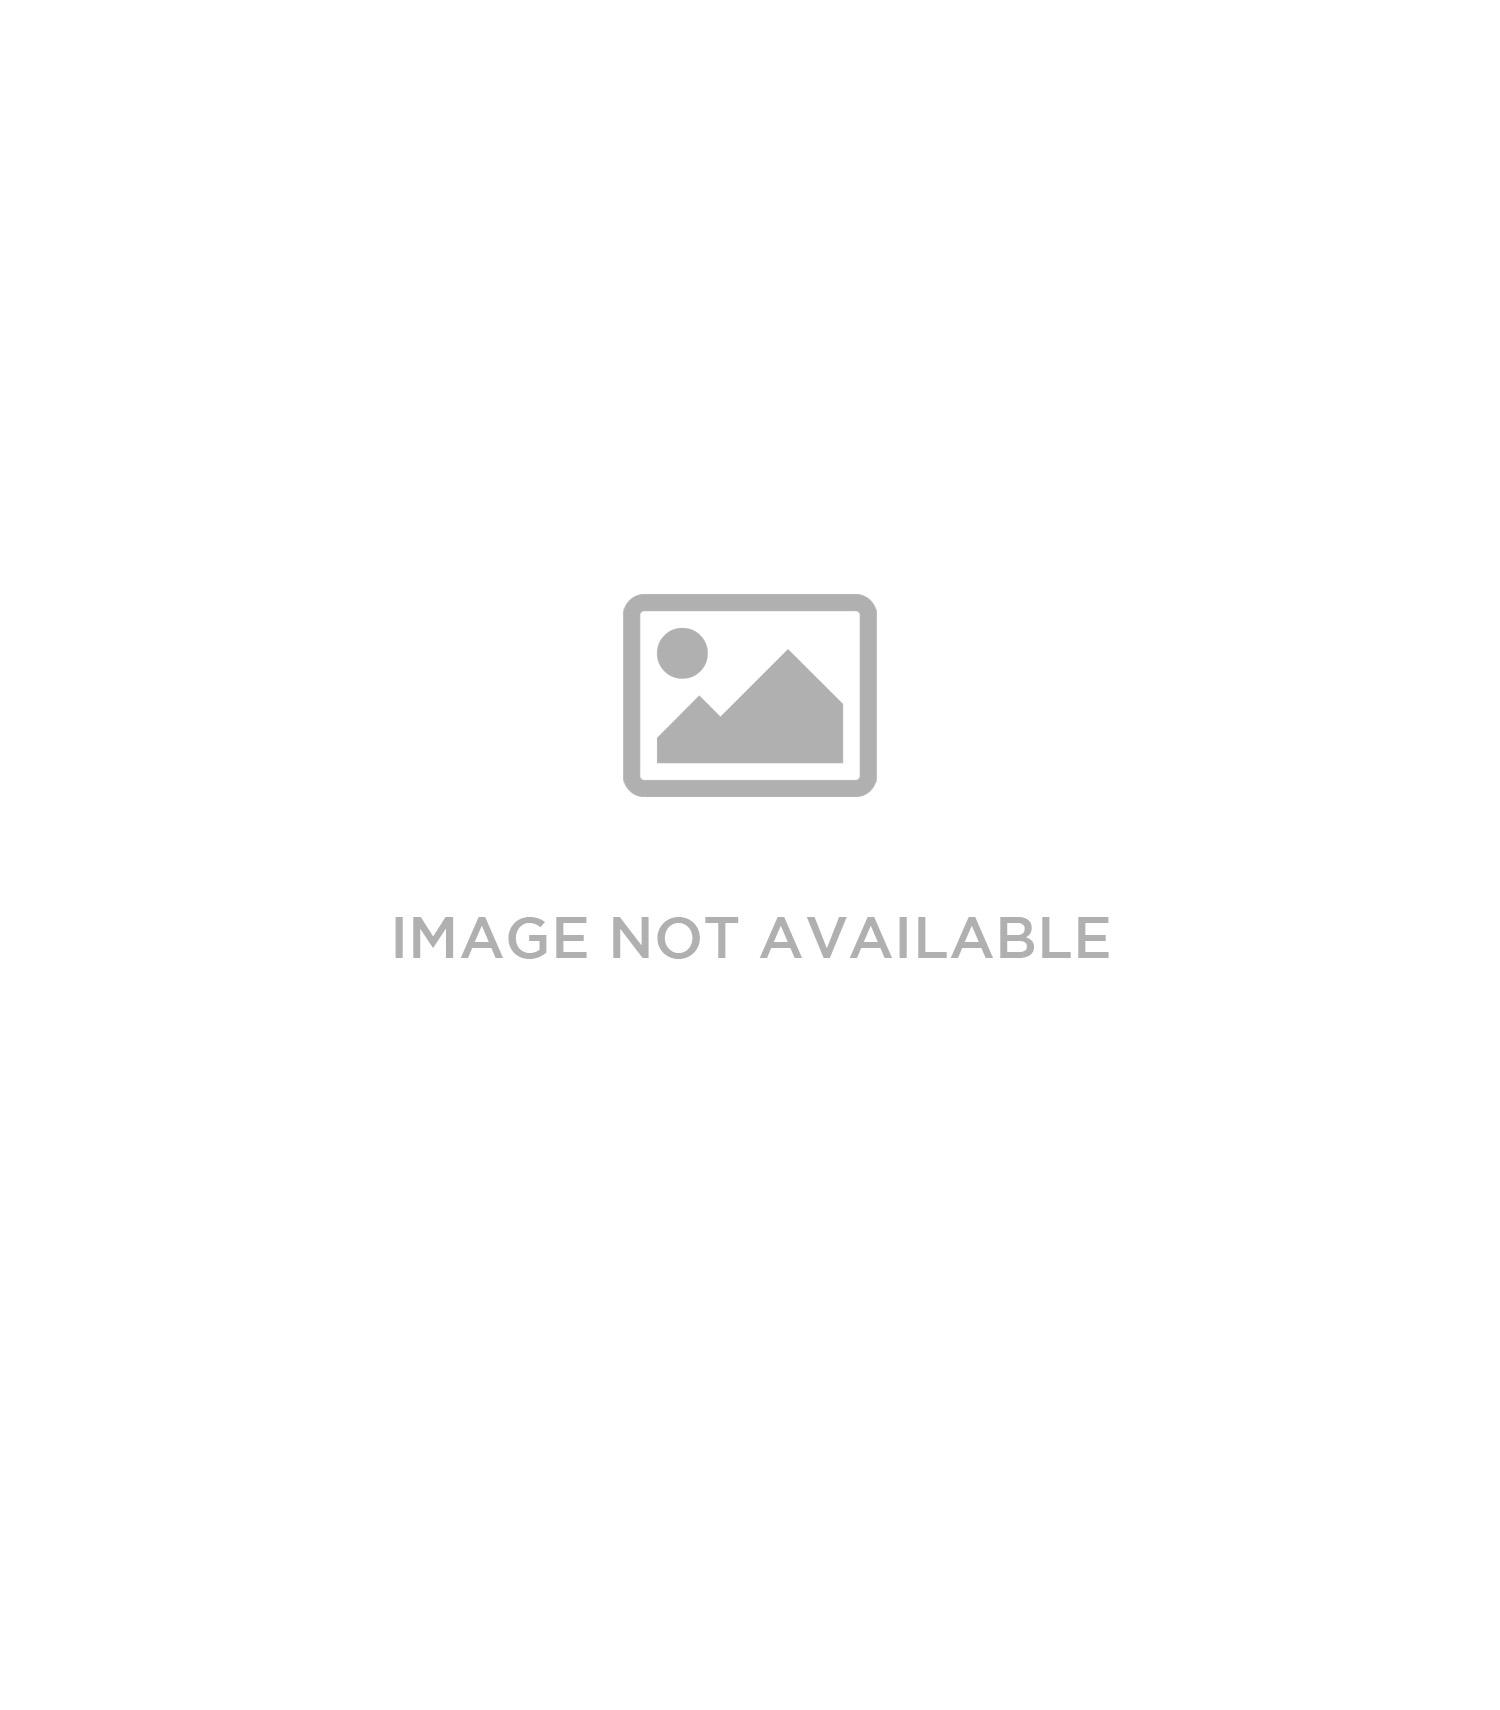 5f4ef8fcf59 OGIO® ENDURANCE APEX CAP. OE650 - Accessories - Shop Catalogue